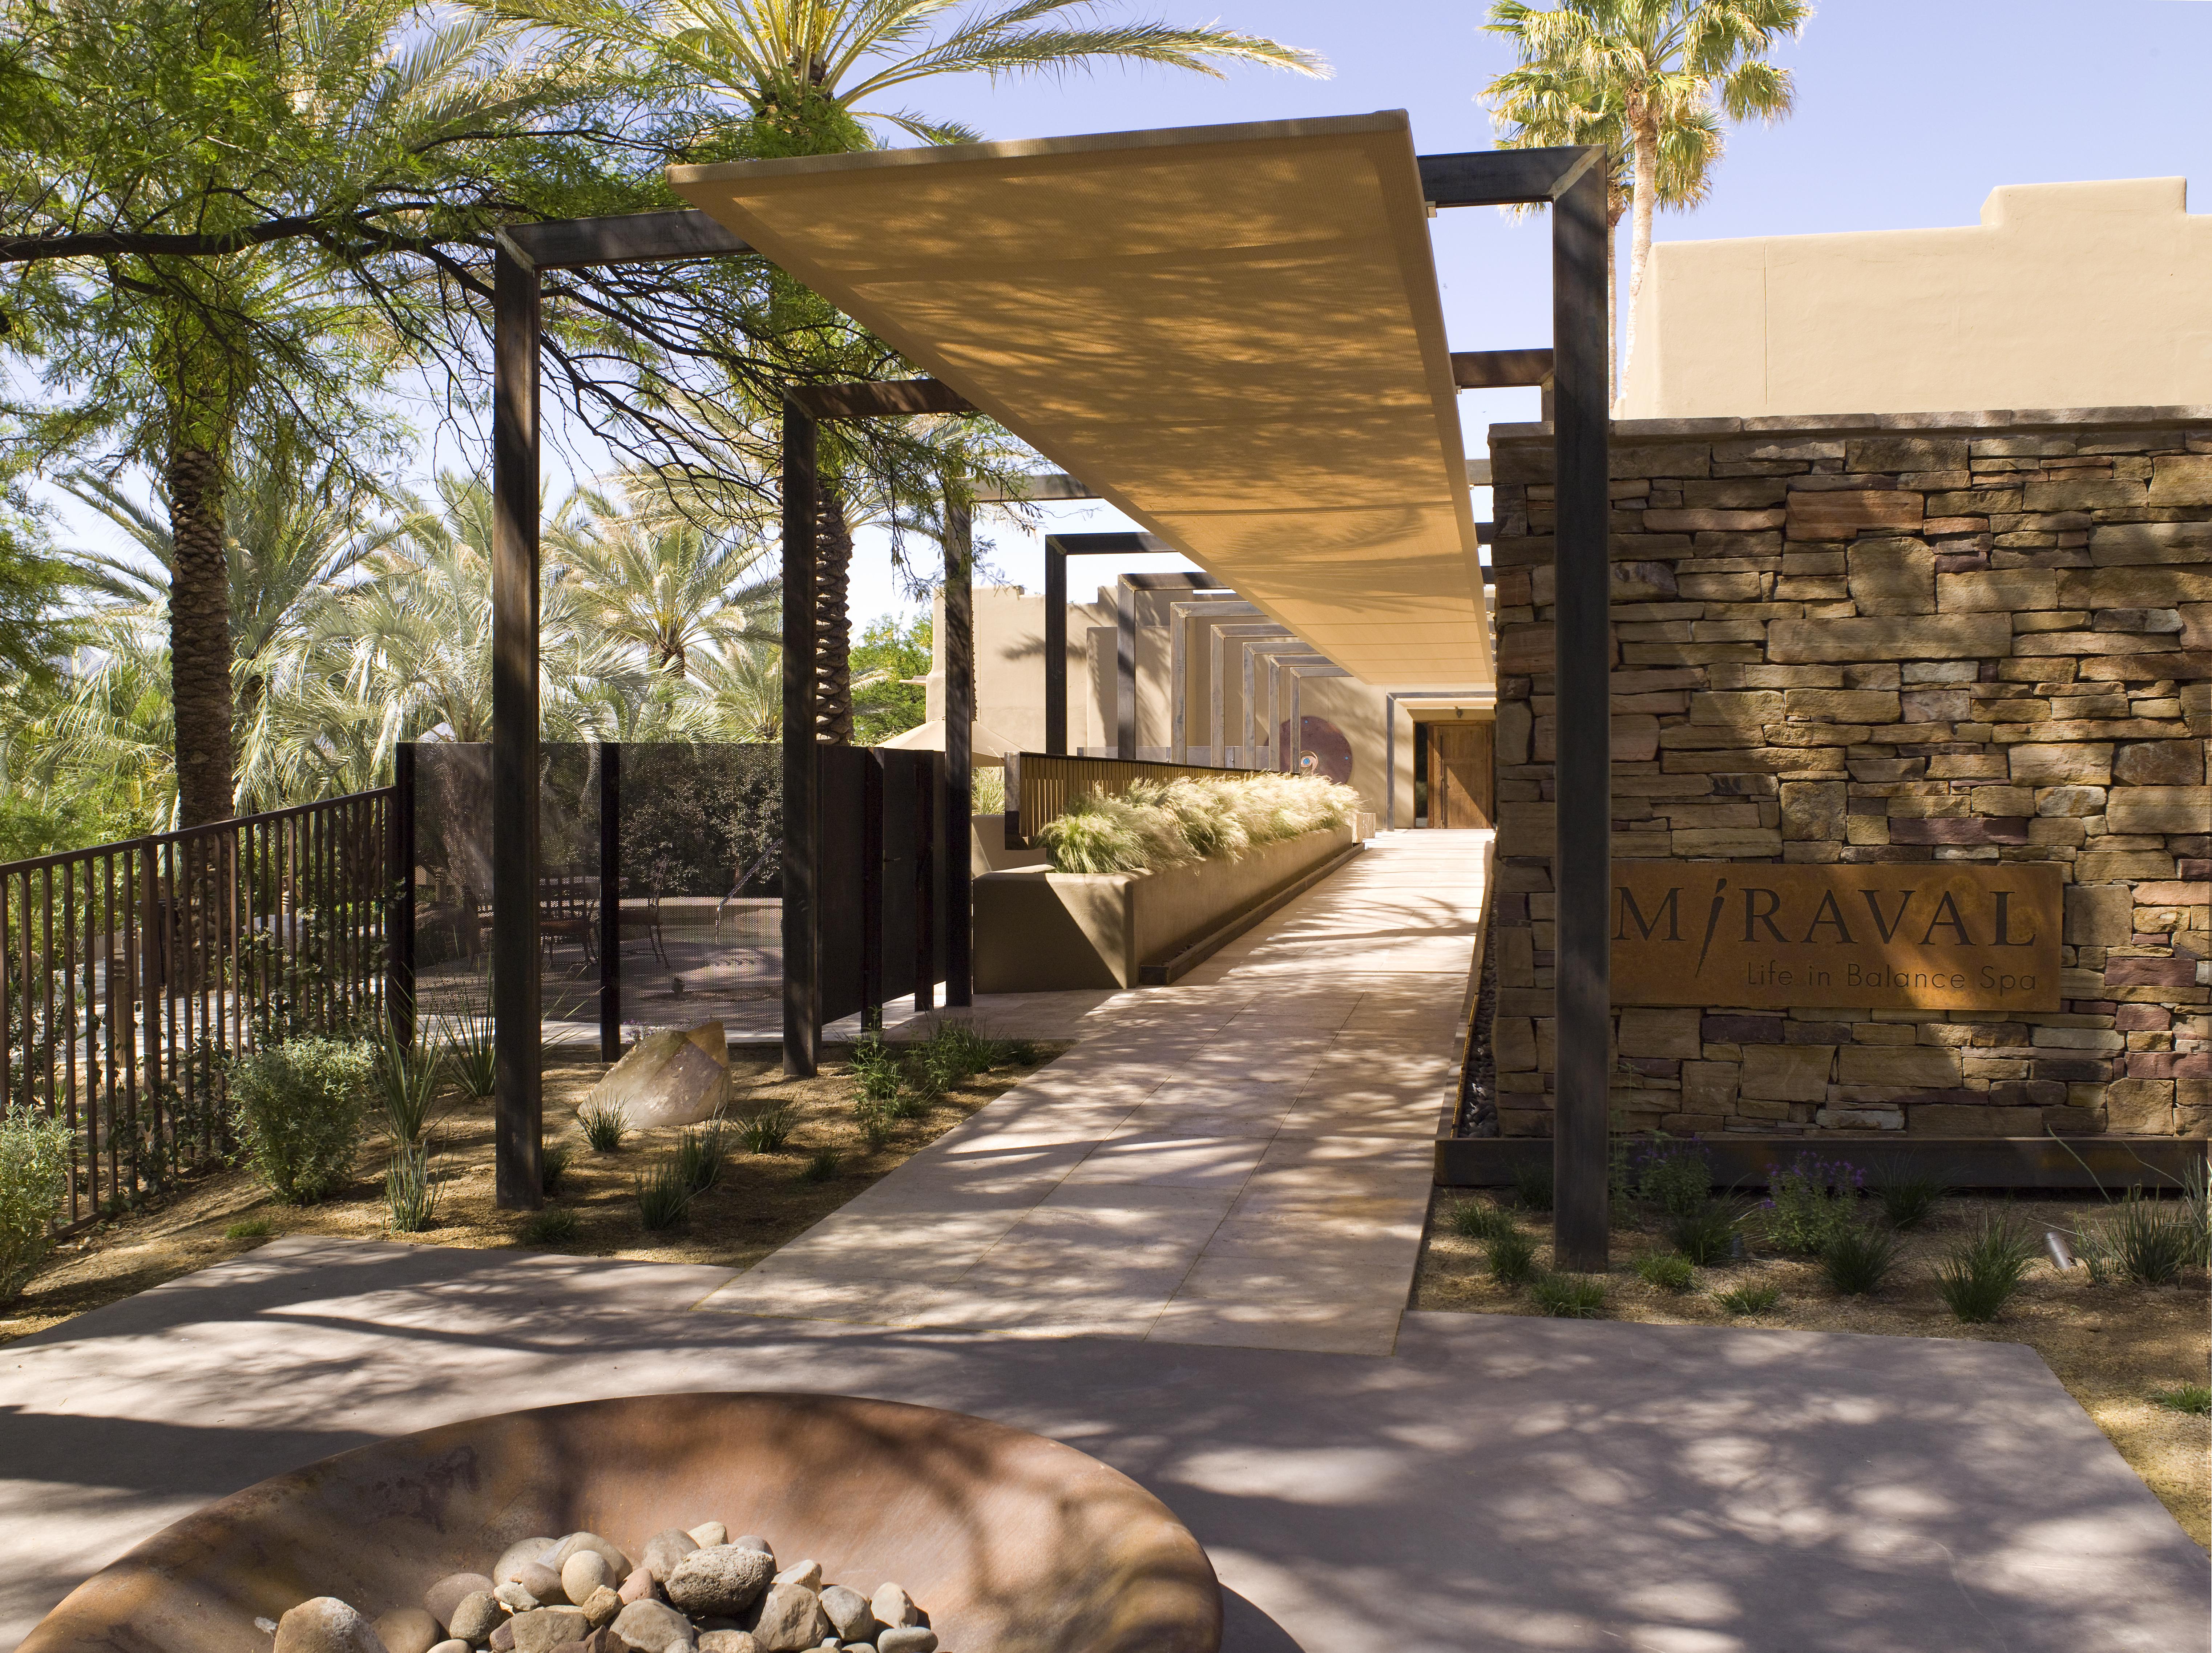 Hyatt spent $215 million to acquire the Miraval wellness resort brand last January.